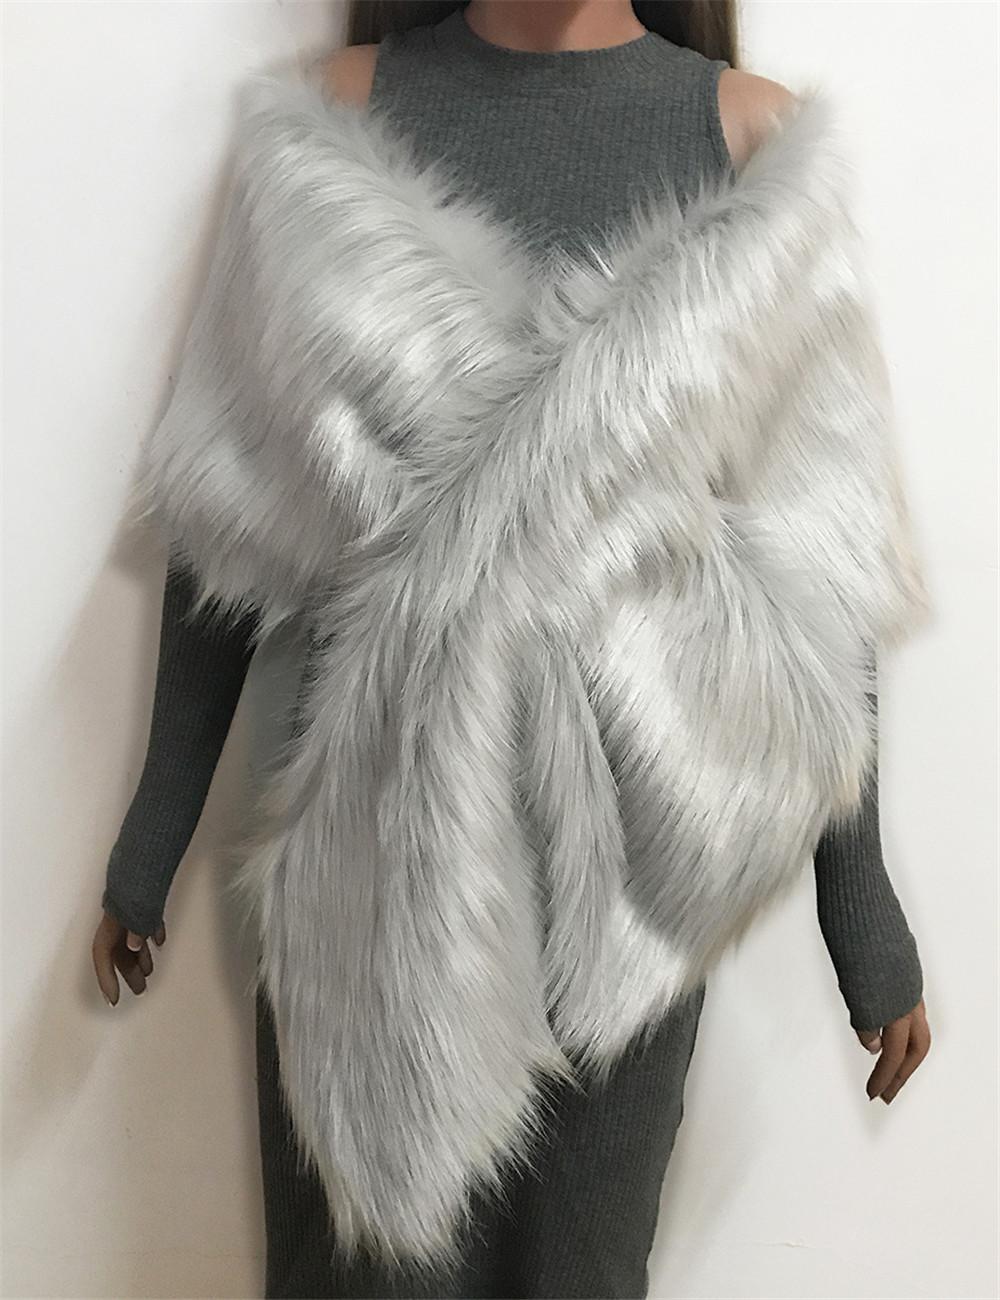 The autumn and winter new imitation fur big cape neck scarf multi-color joker scarf bride dress cross cape (3)